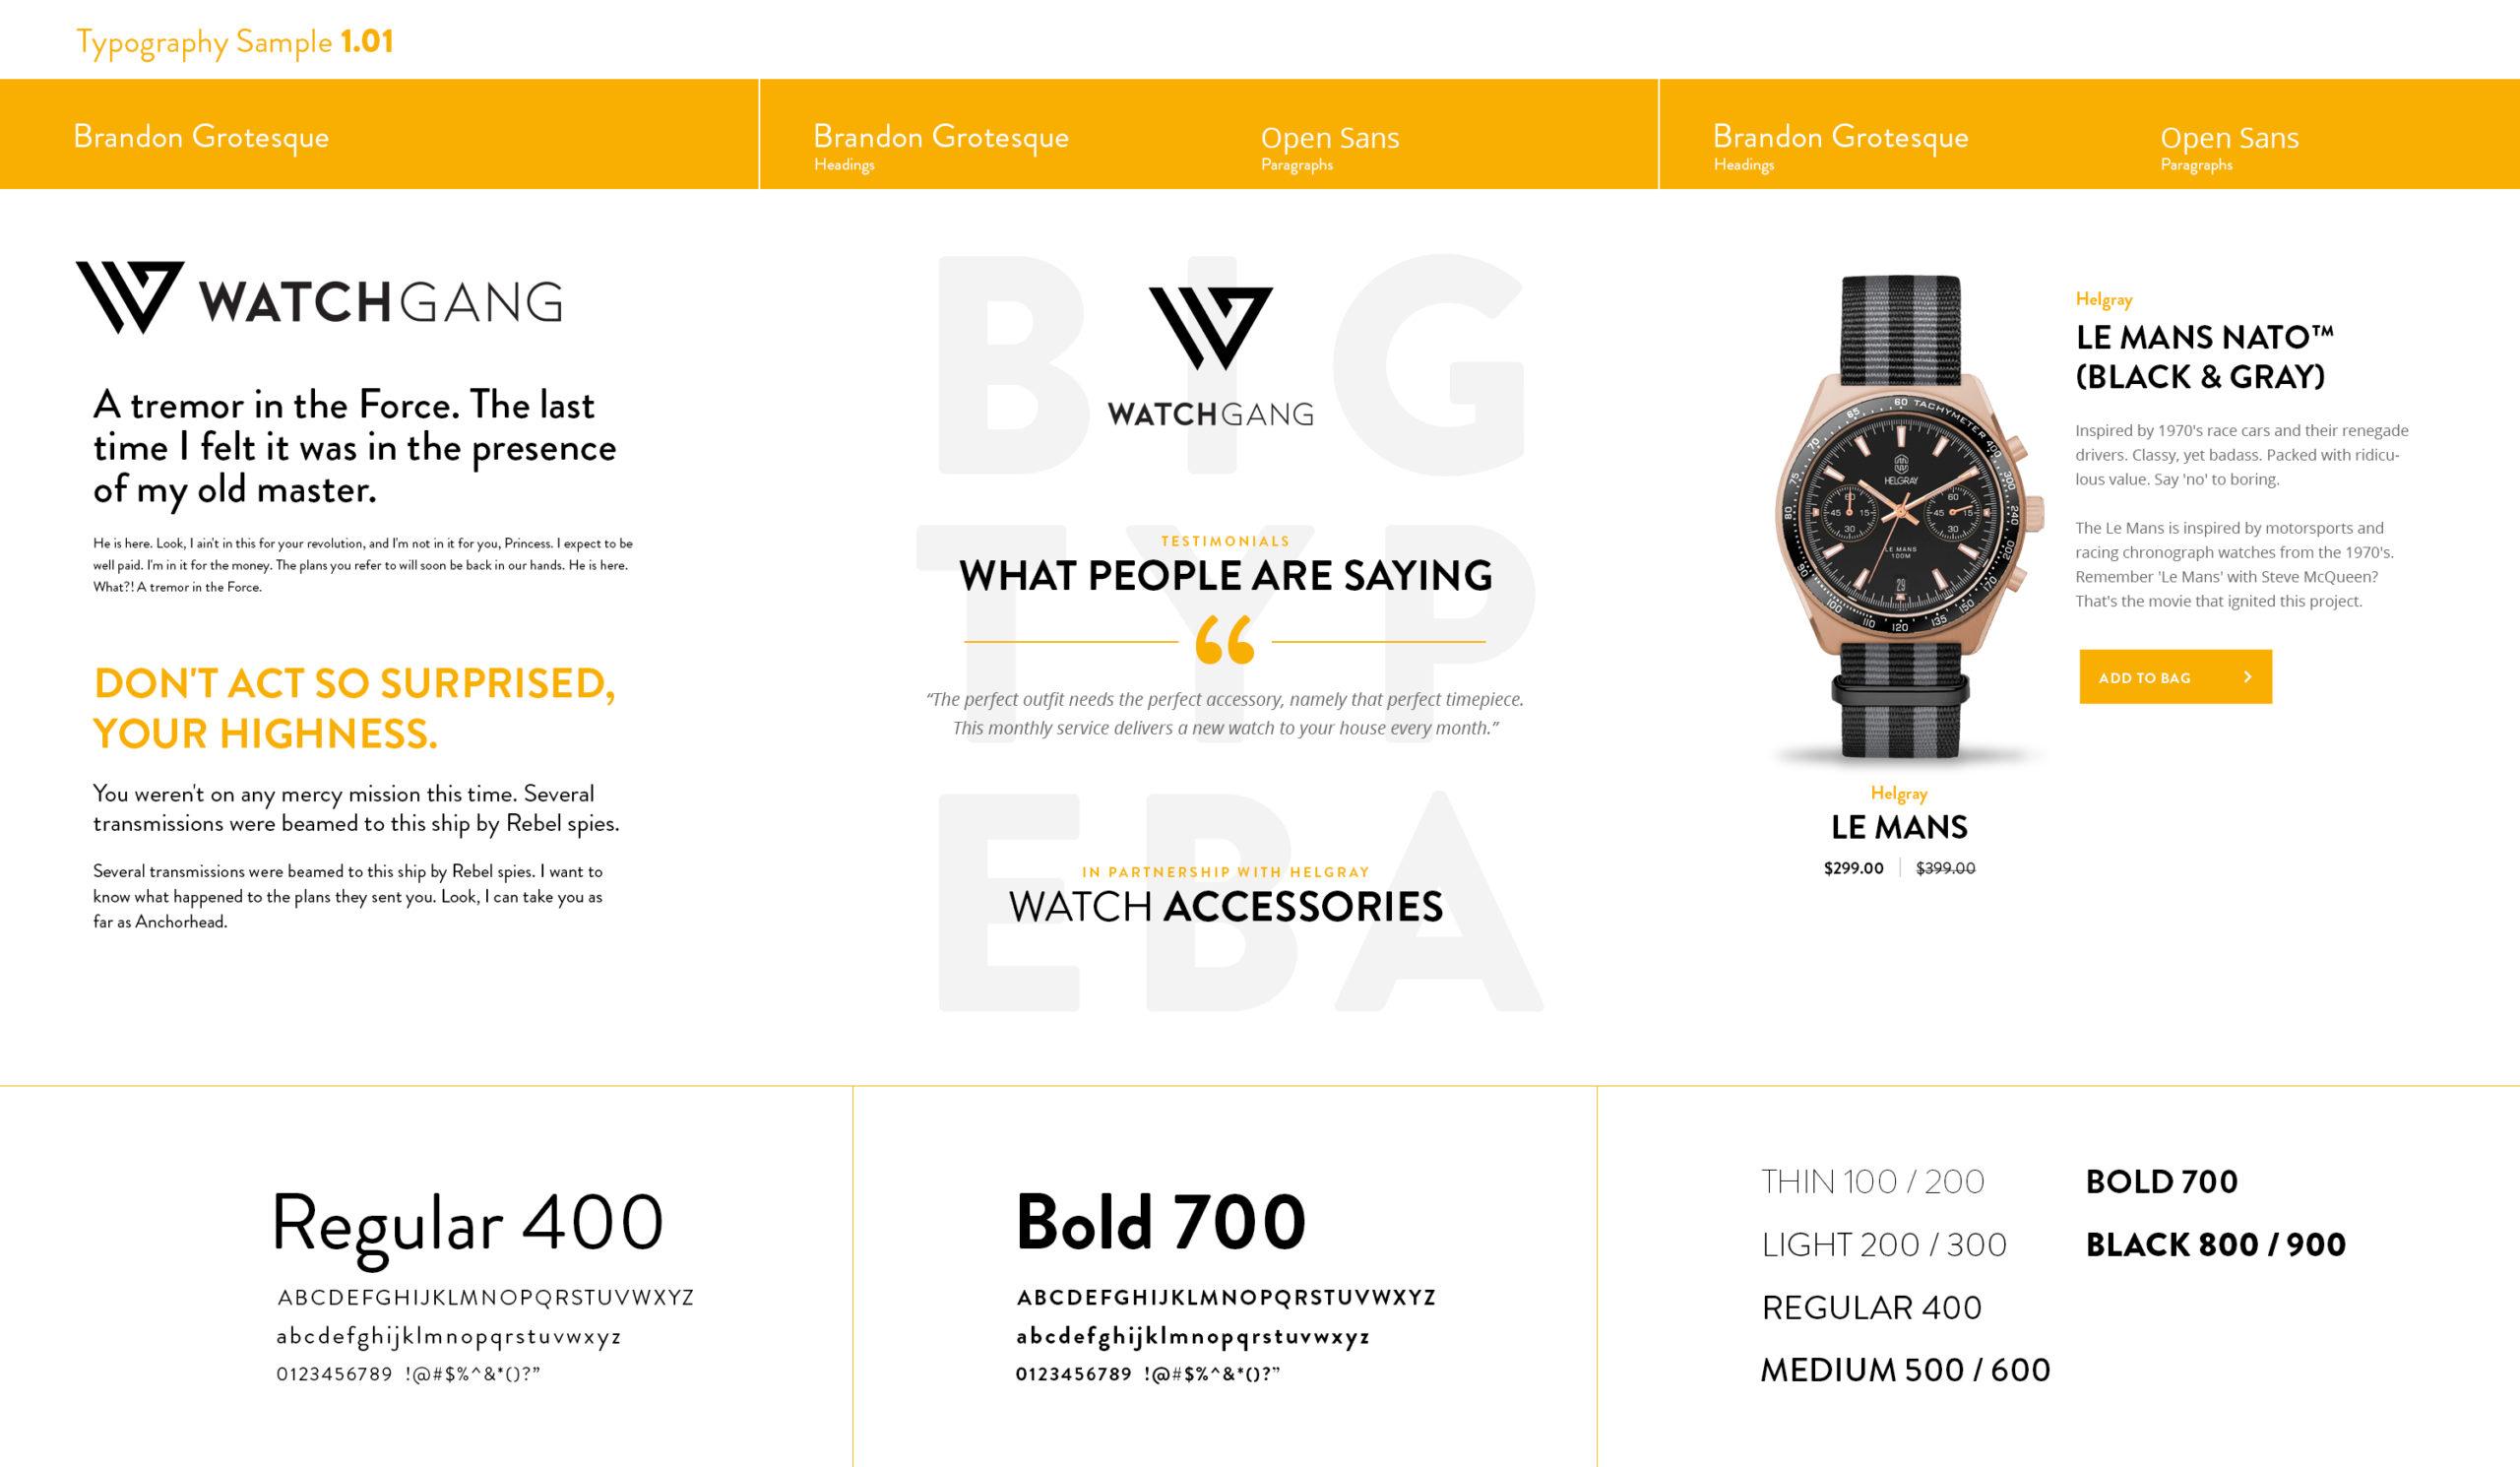 typography-sample-1.01-brandon